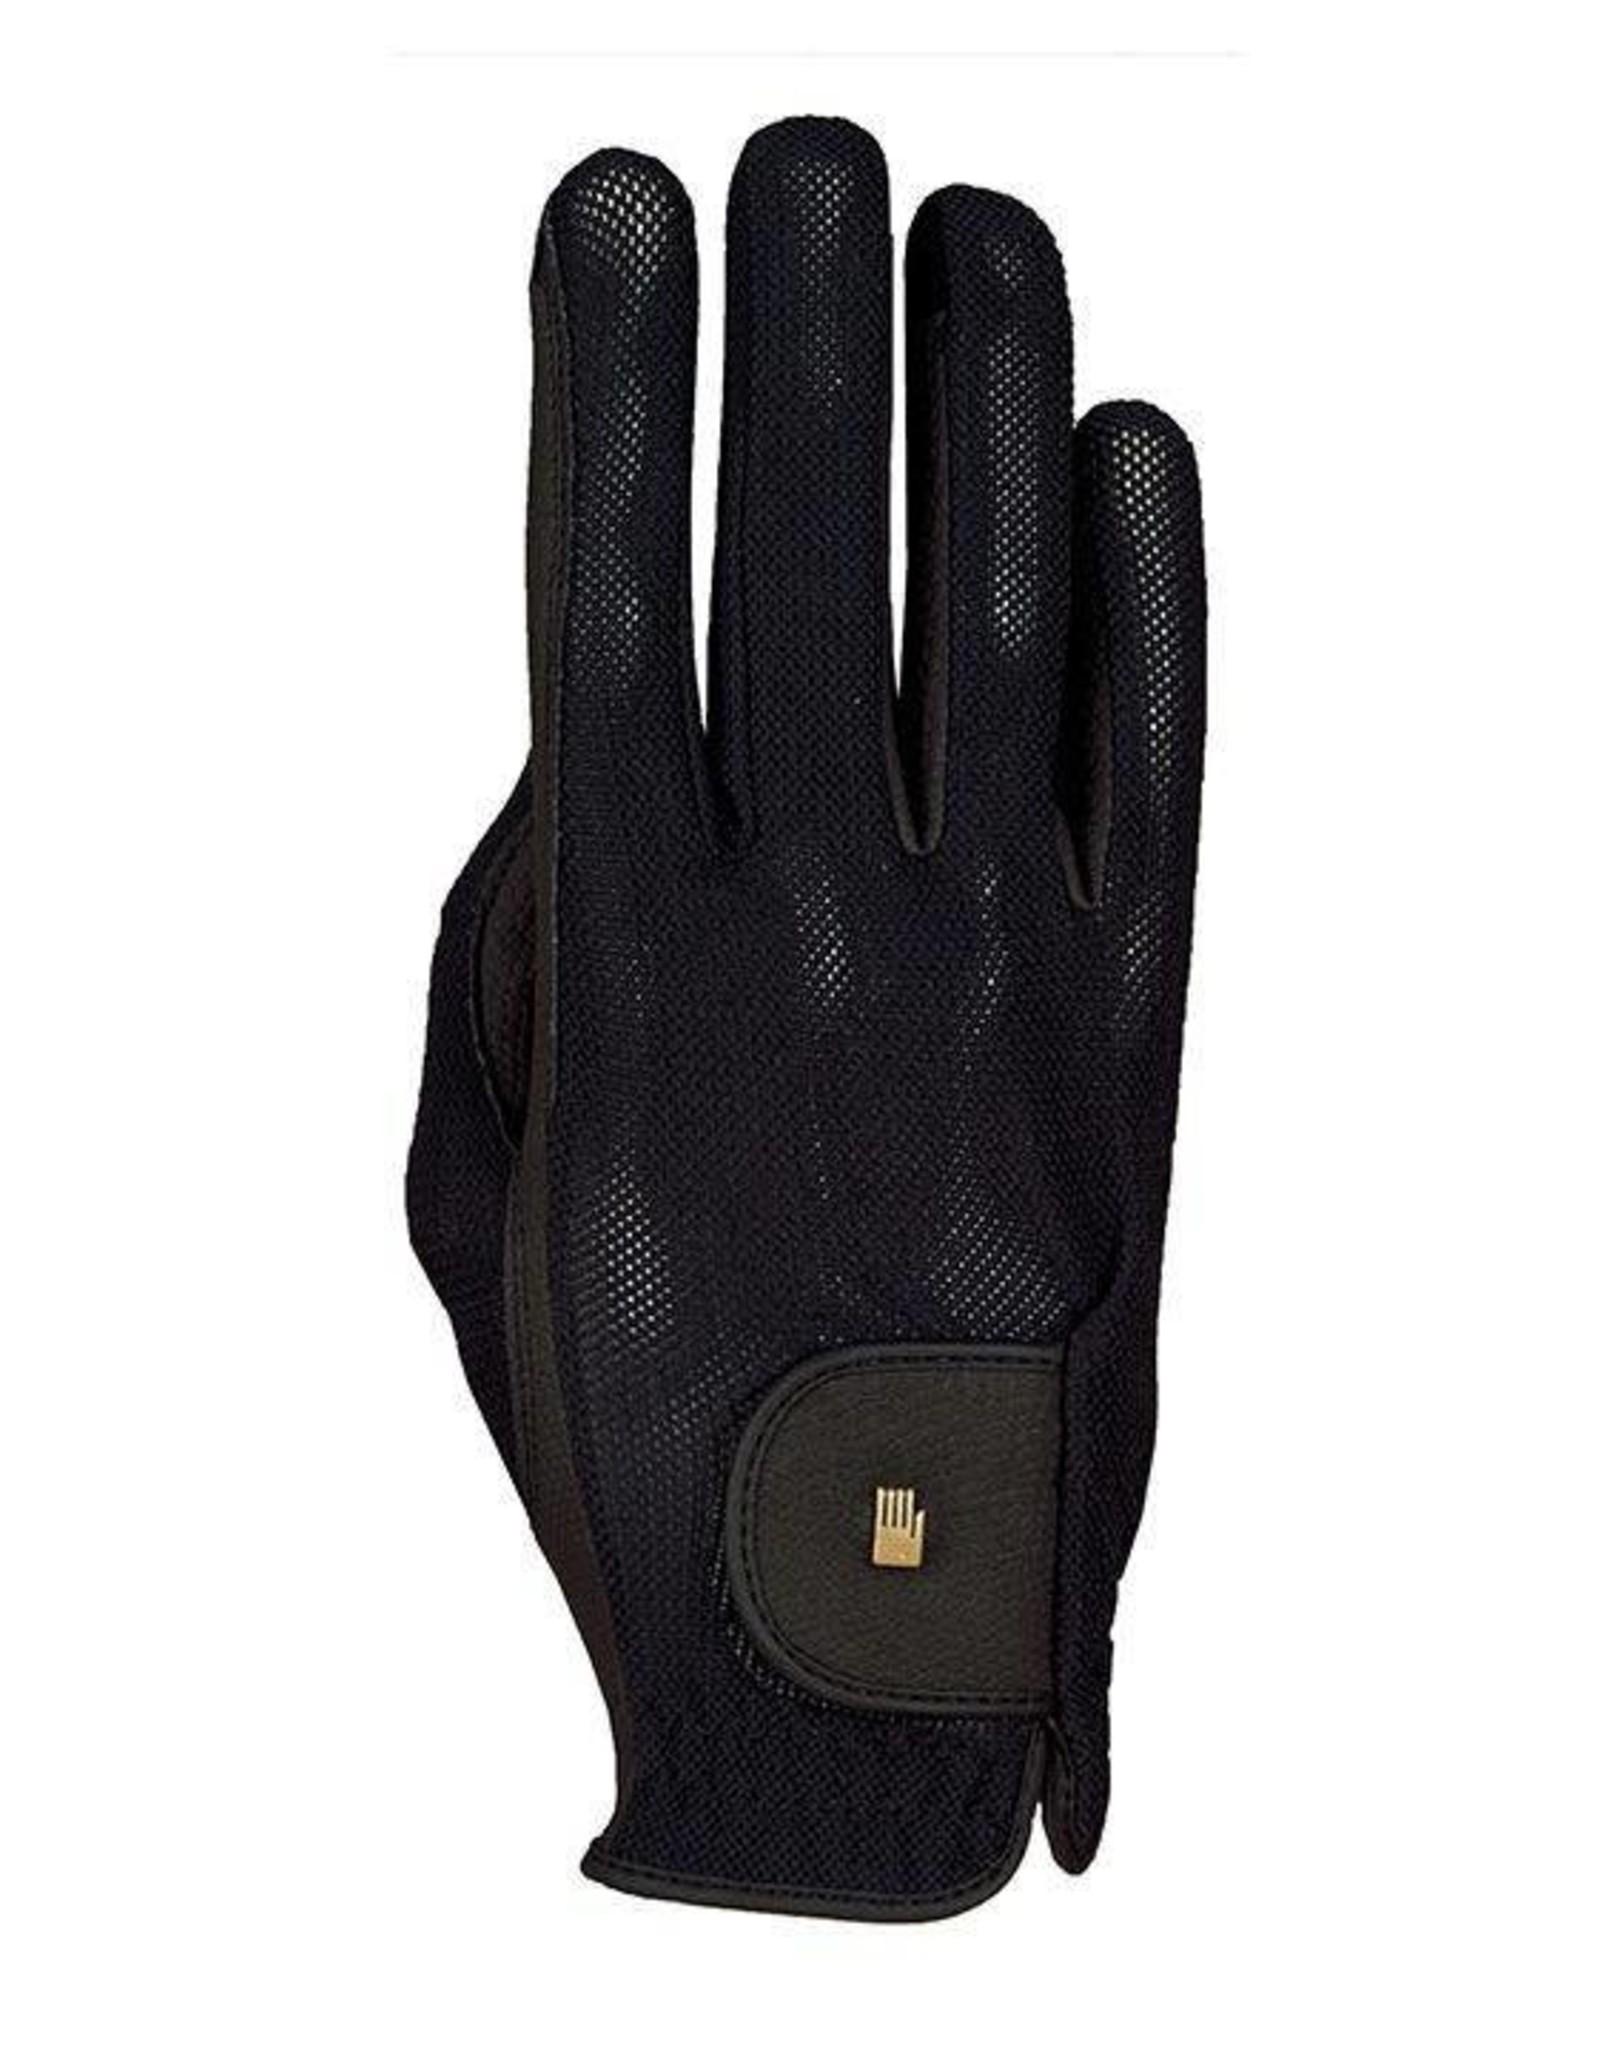 Roeckl Roeckl-Grip Lite Riding Gloves